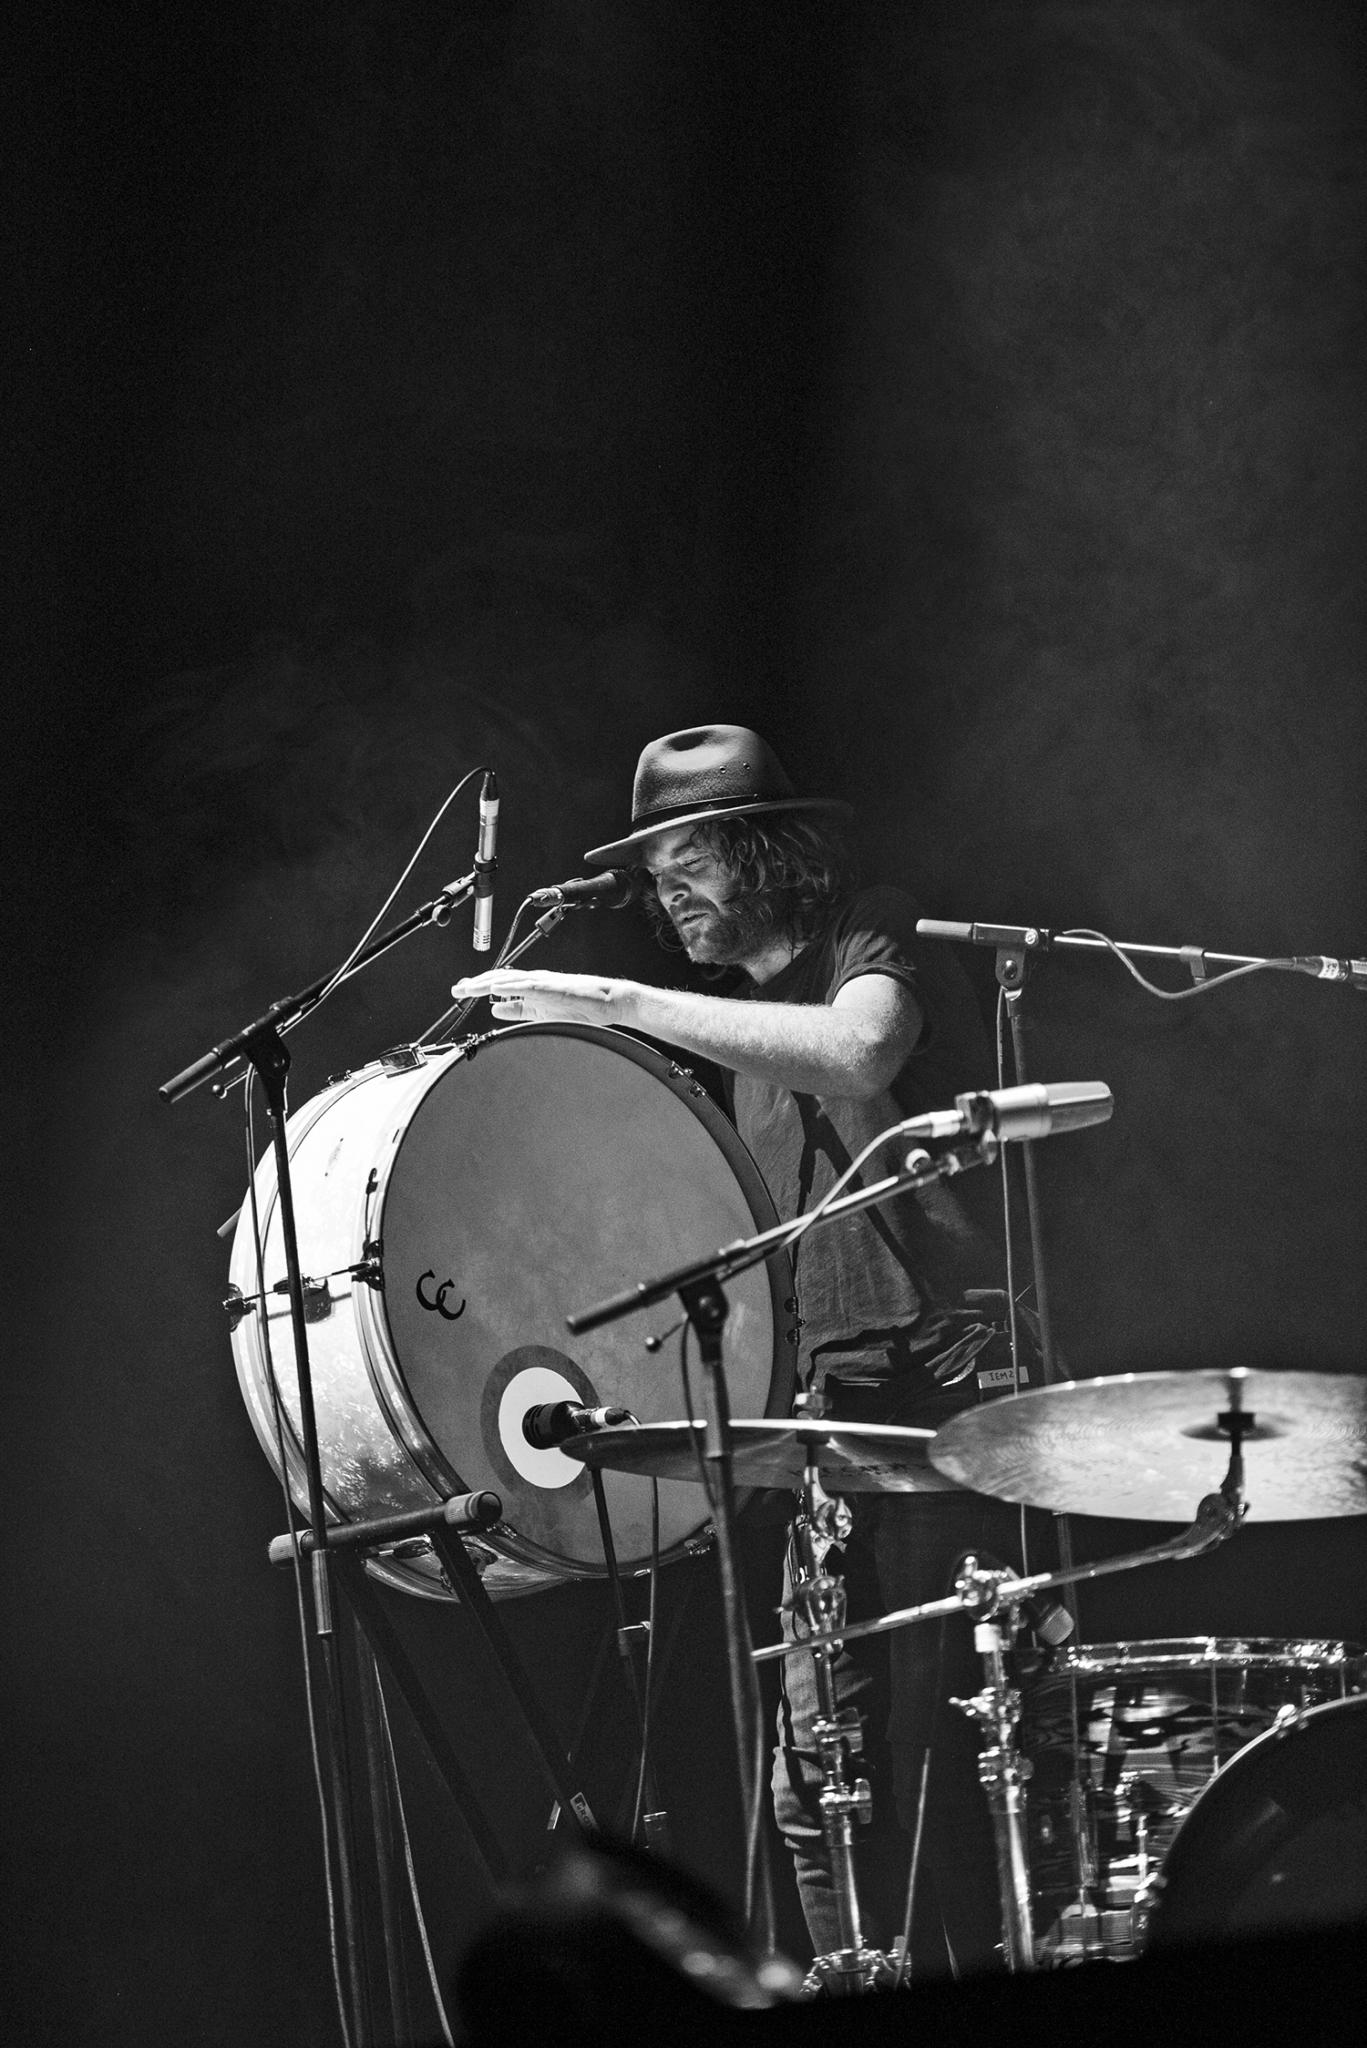 Drummer Paul Hamilton